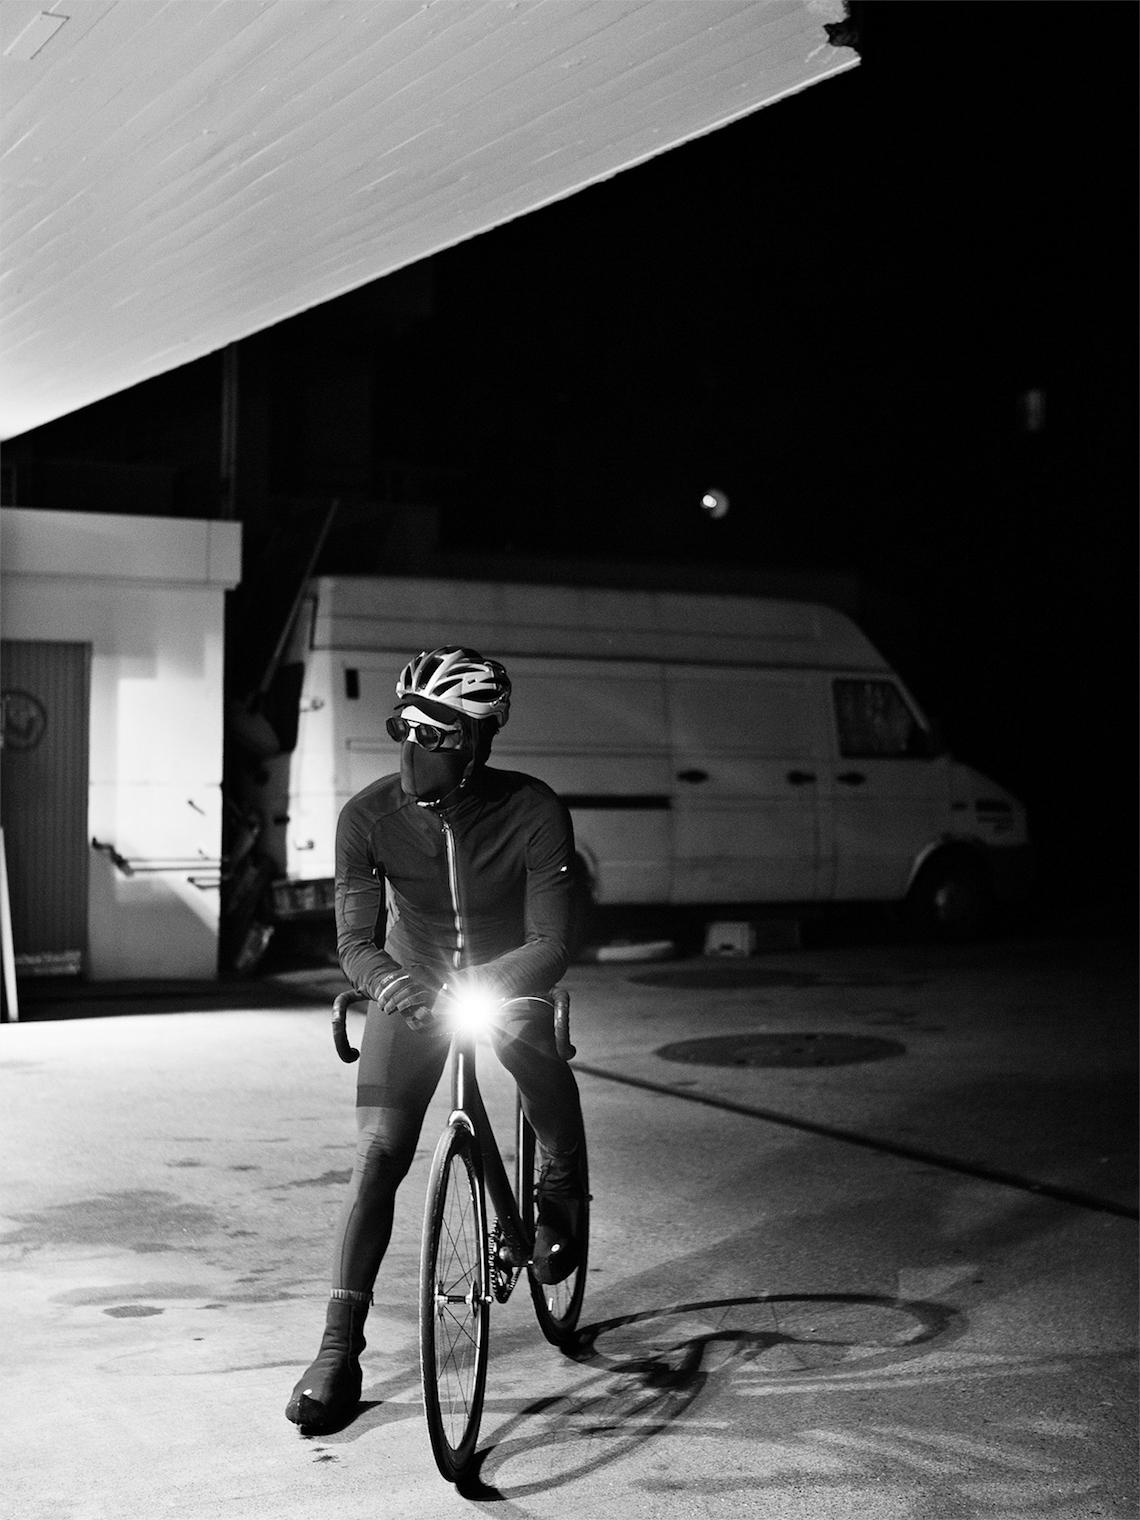 Janosch Abel Socialpictures_Ghost_Town_5